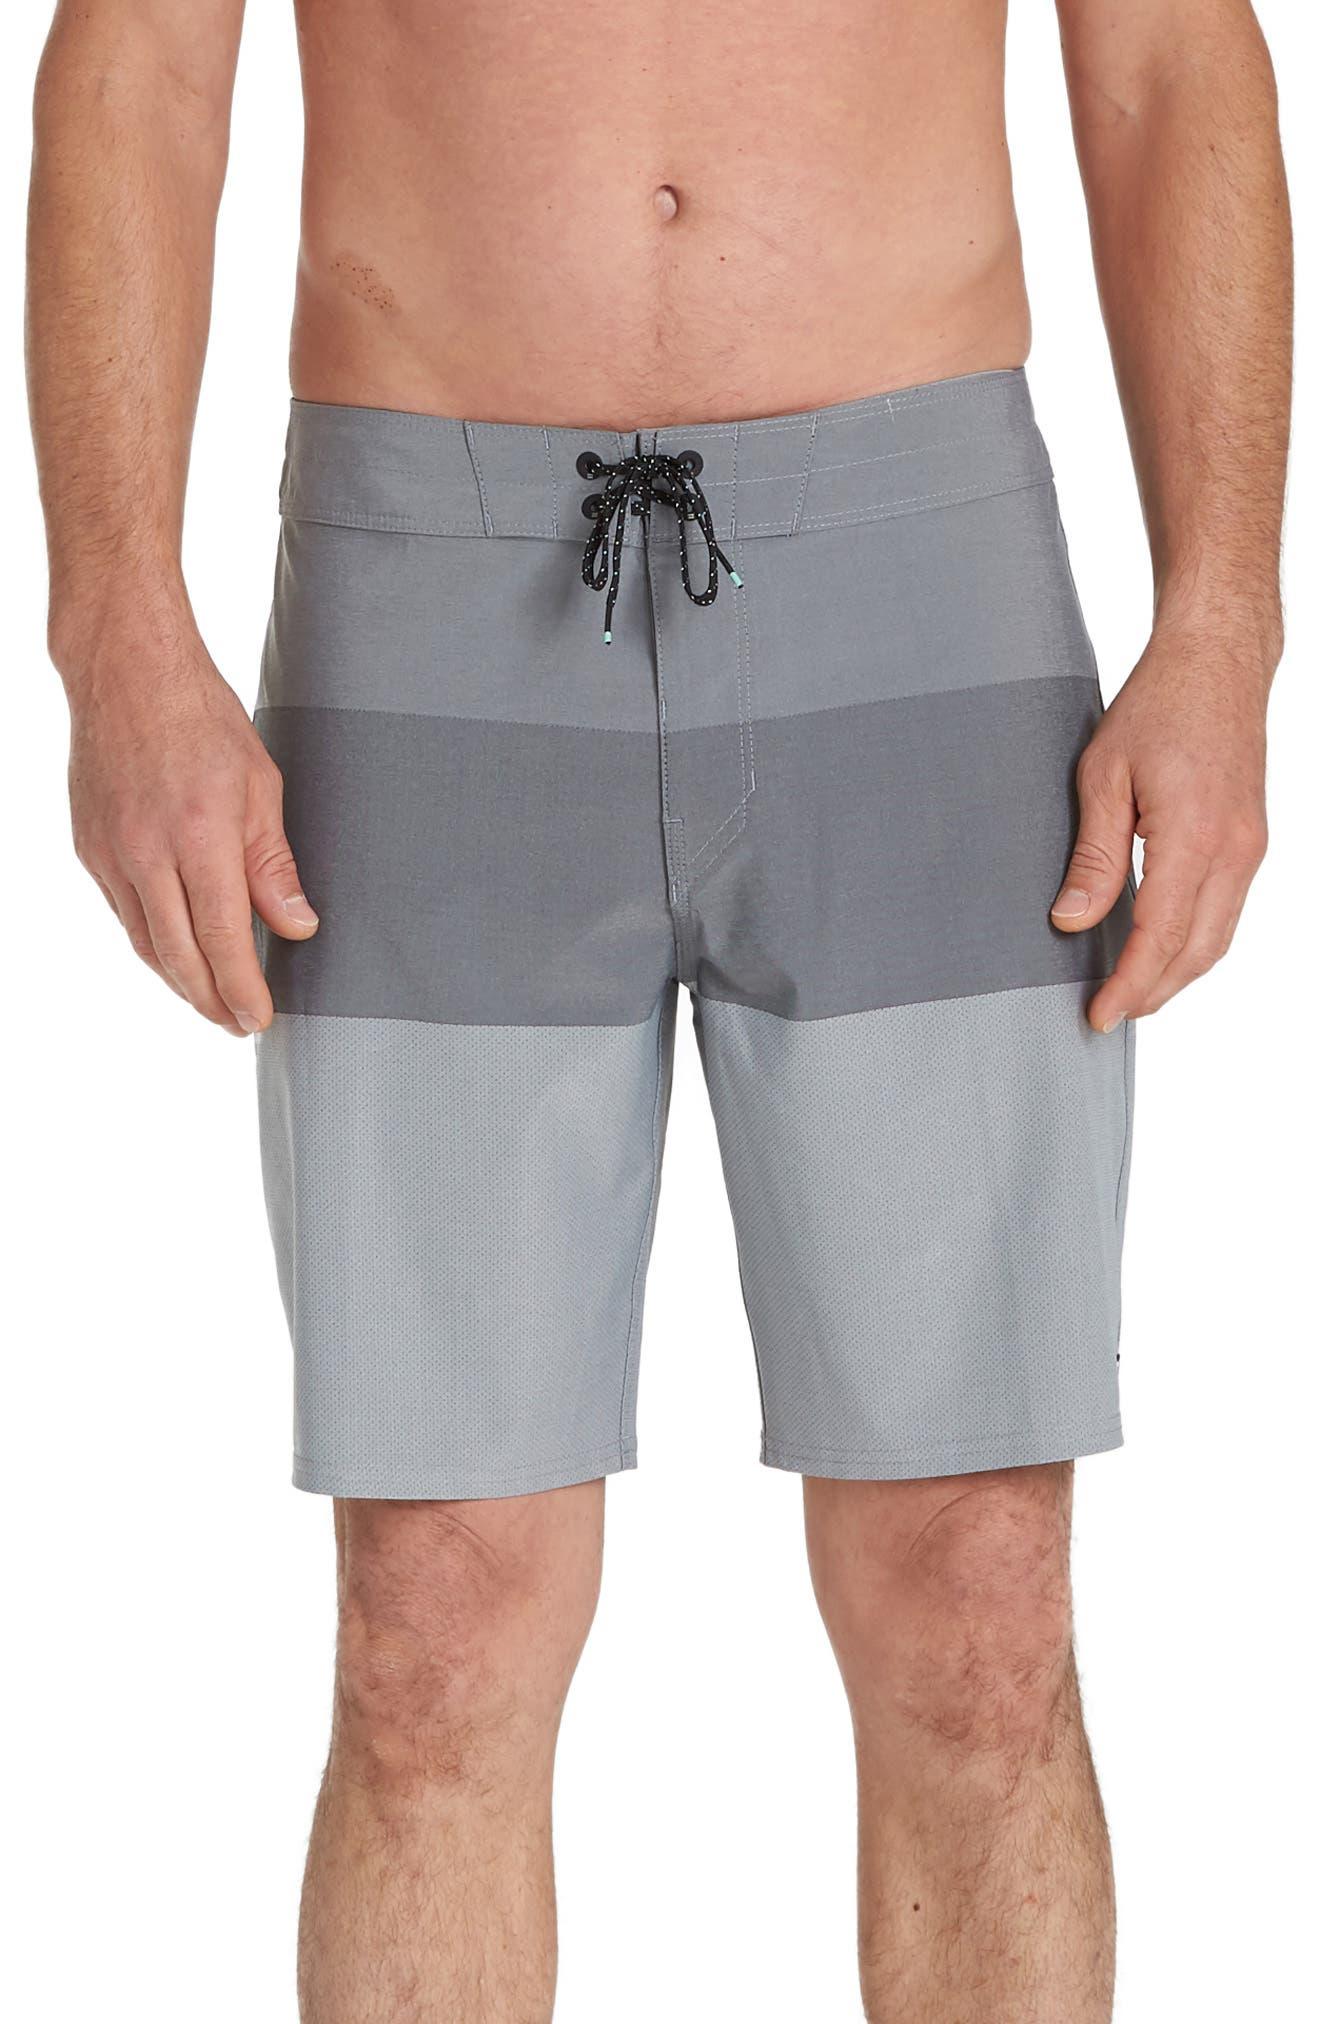 Billabong Airlite Board Shorts, Grey